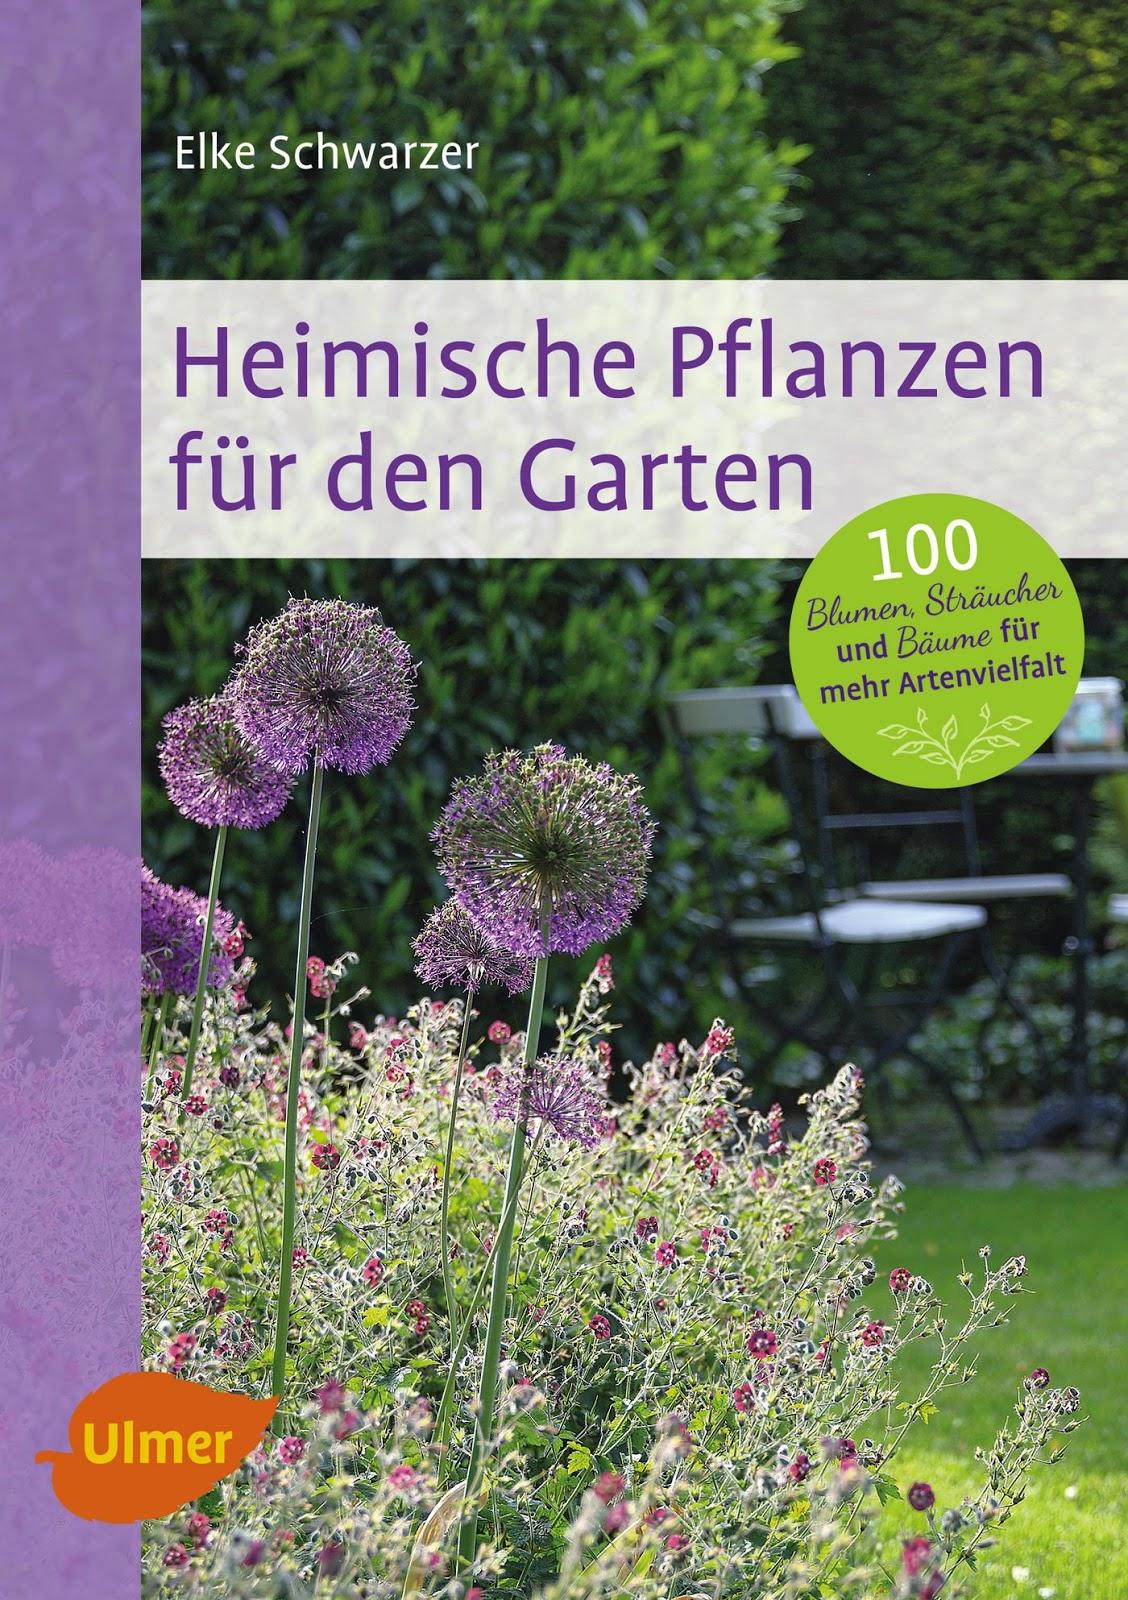 Staudengarten gross potrems heimische pflanzen f r den garten - Pflanzen fur den vorgarten ...